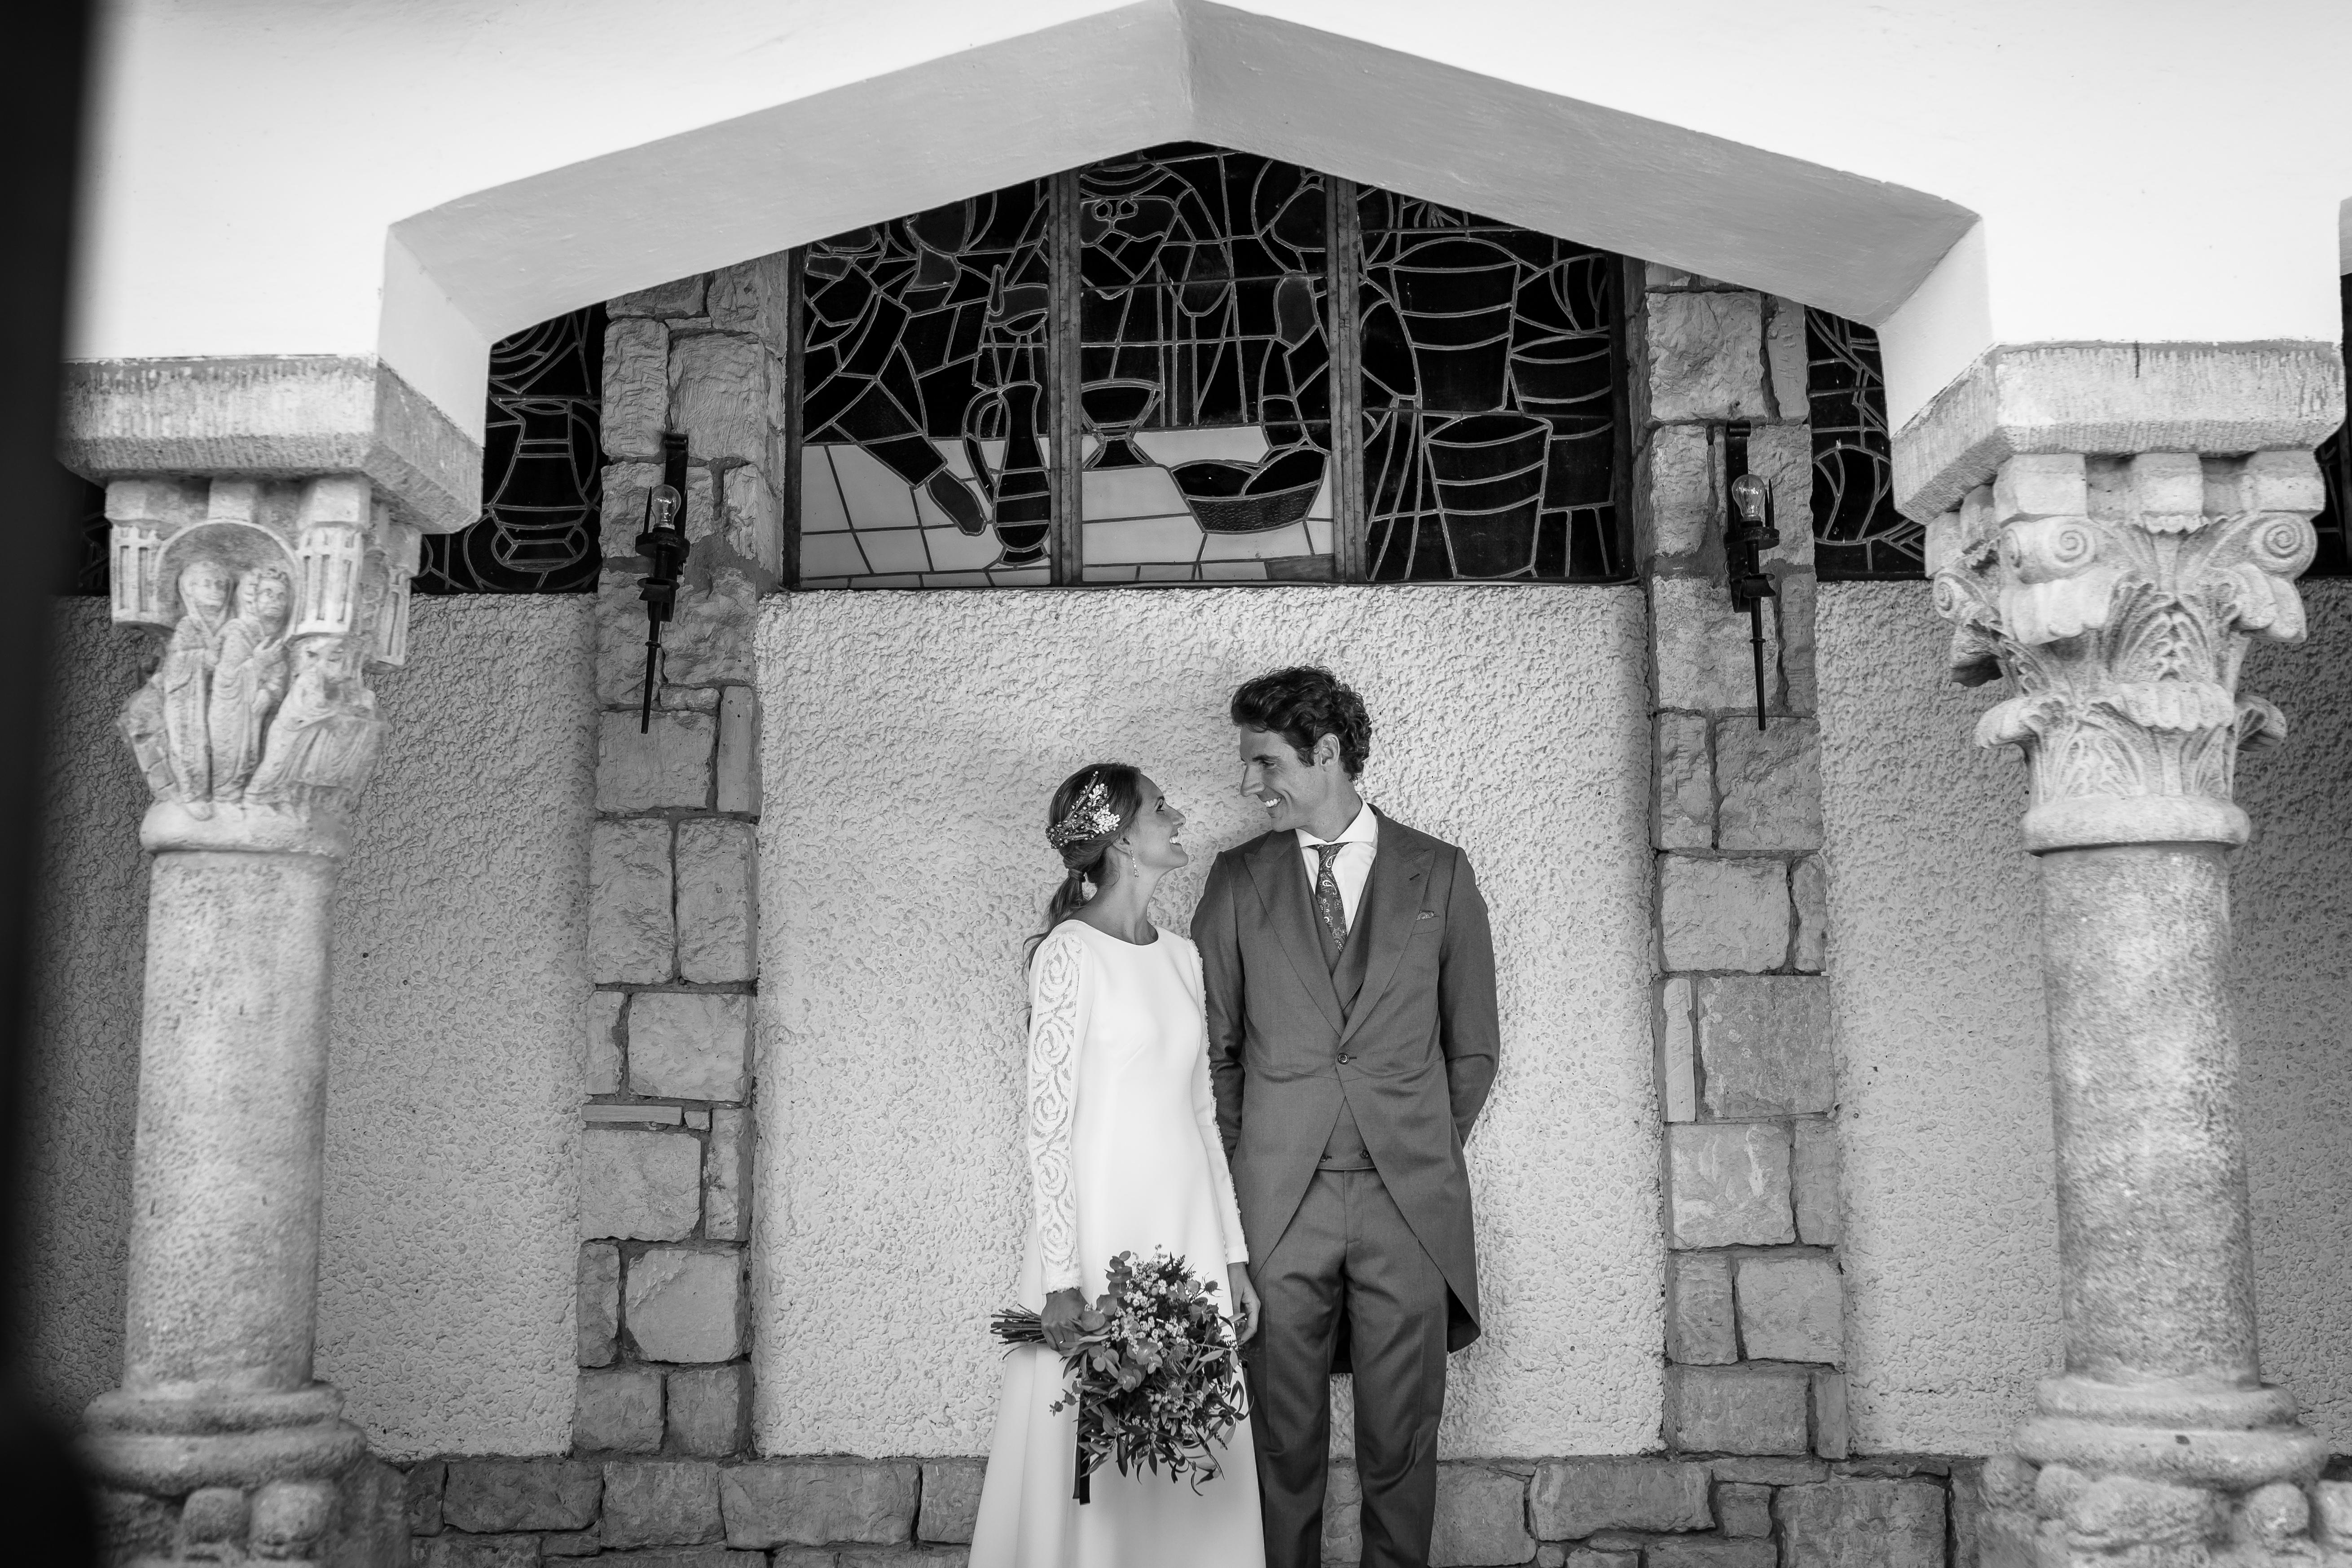 mandarina weddig, fotografos de boda, fotografo boda soria, fotografo boda barcelona, fotografo boda Madrid, fotografo boda lerida, fotografo boda Huesca_34